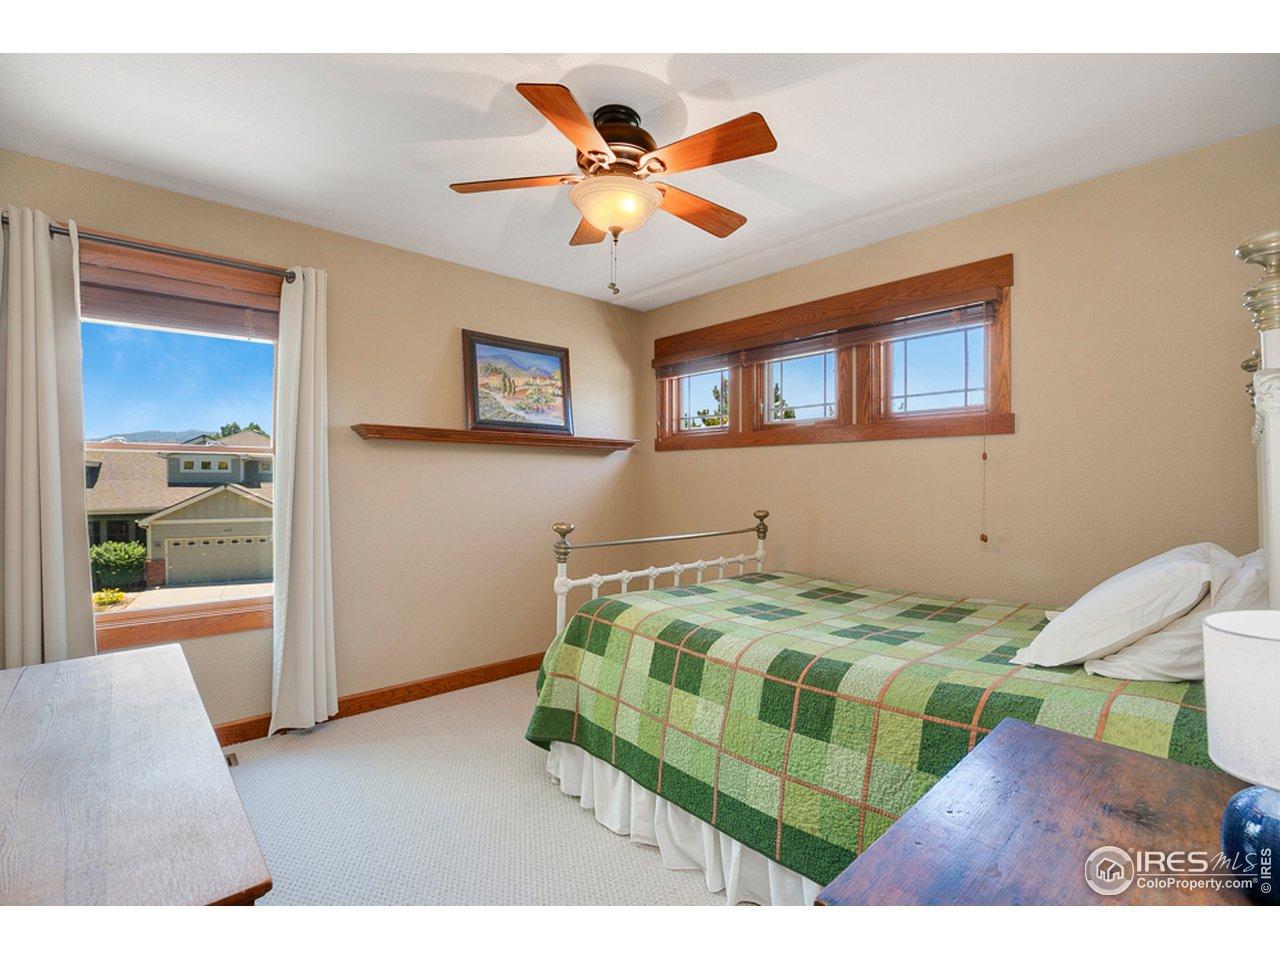 2nd bedroom upstairs look at those great wood windows!